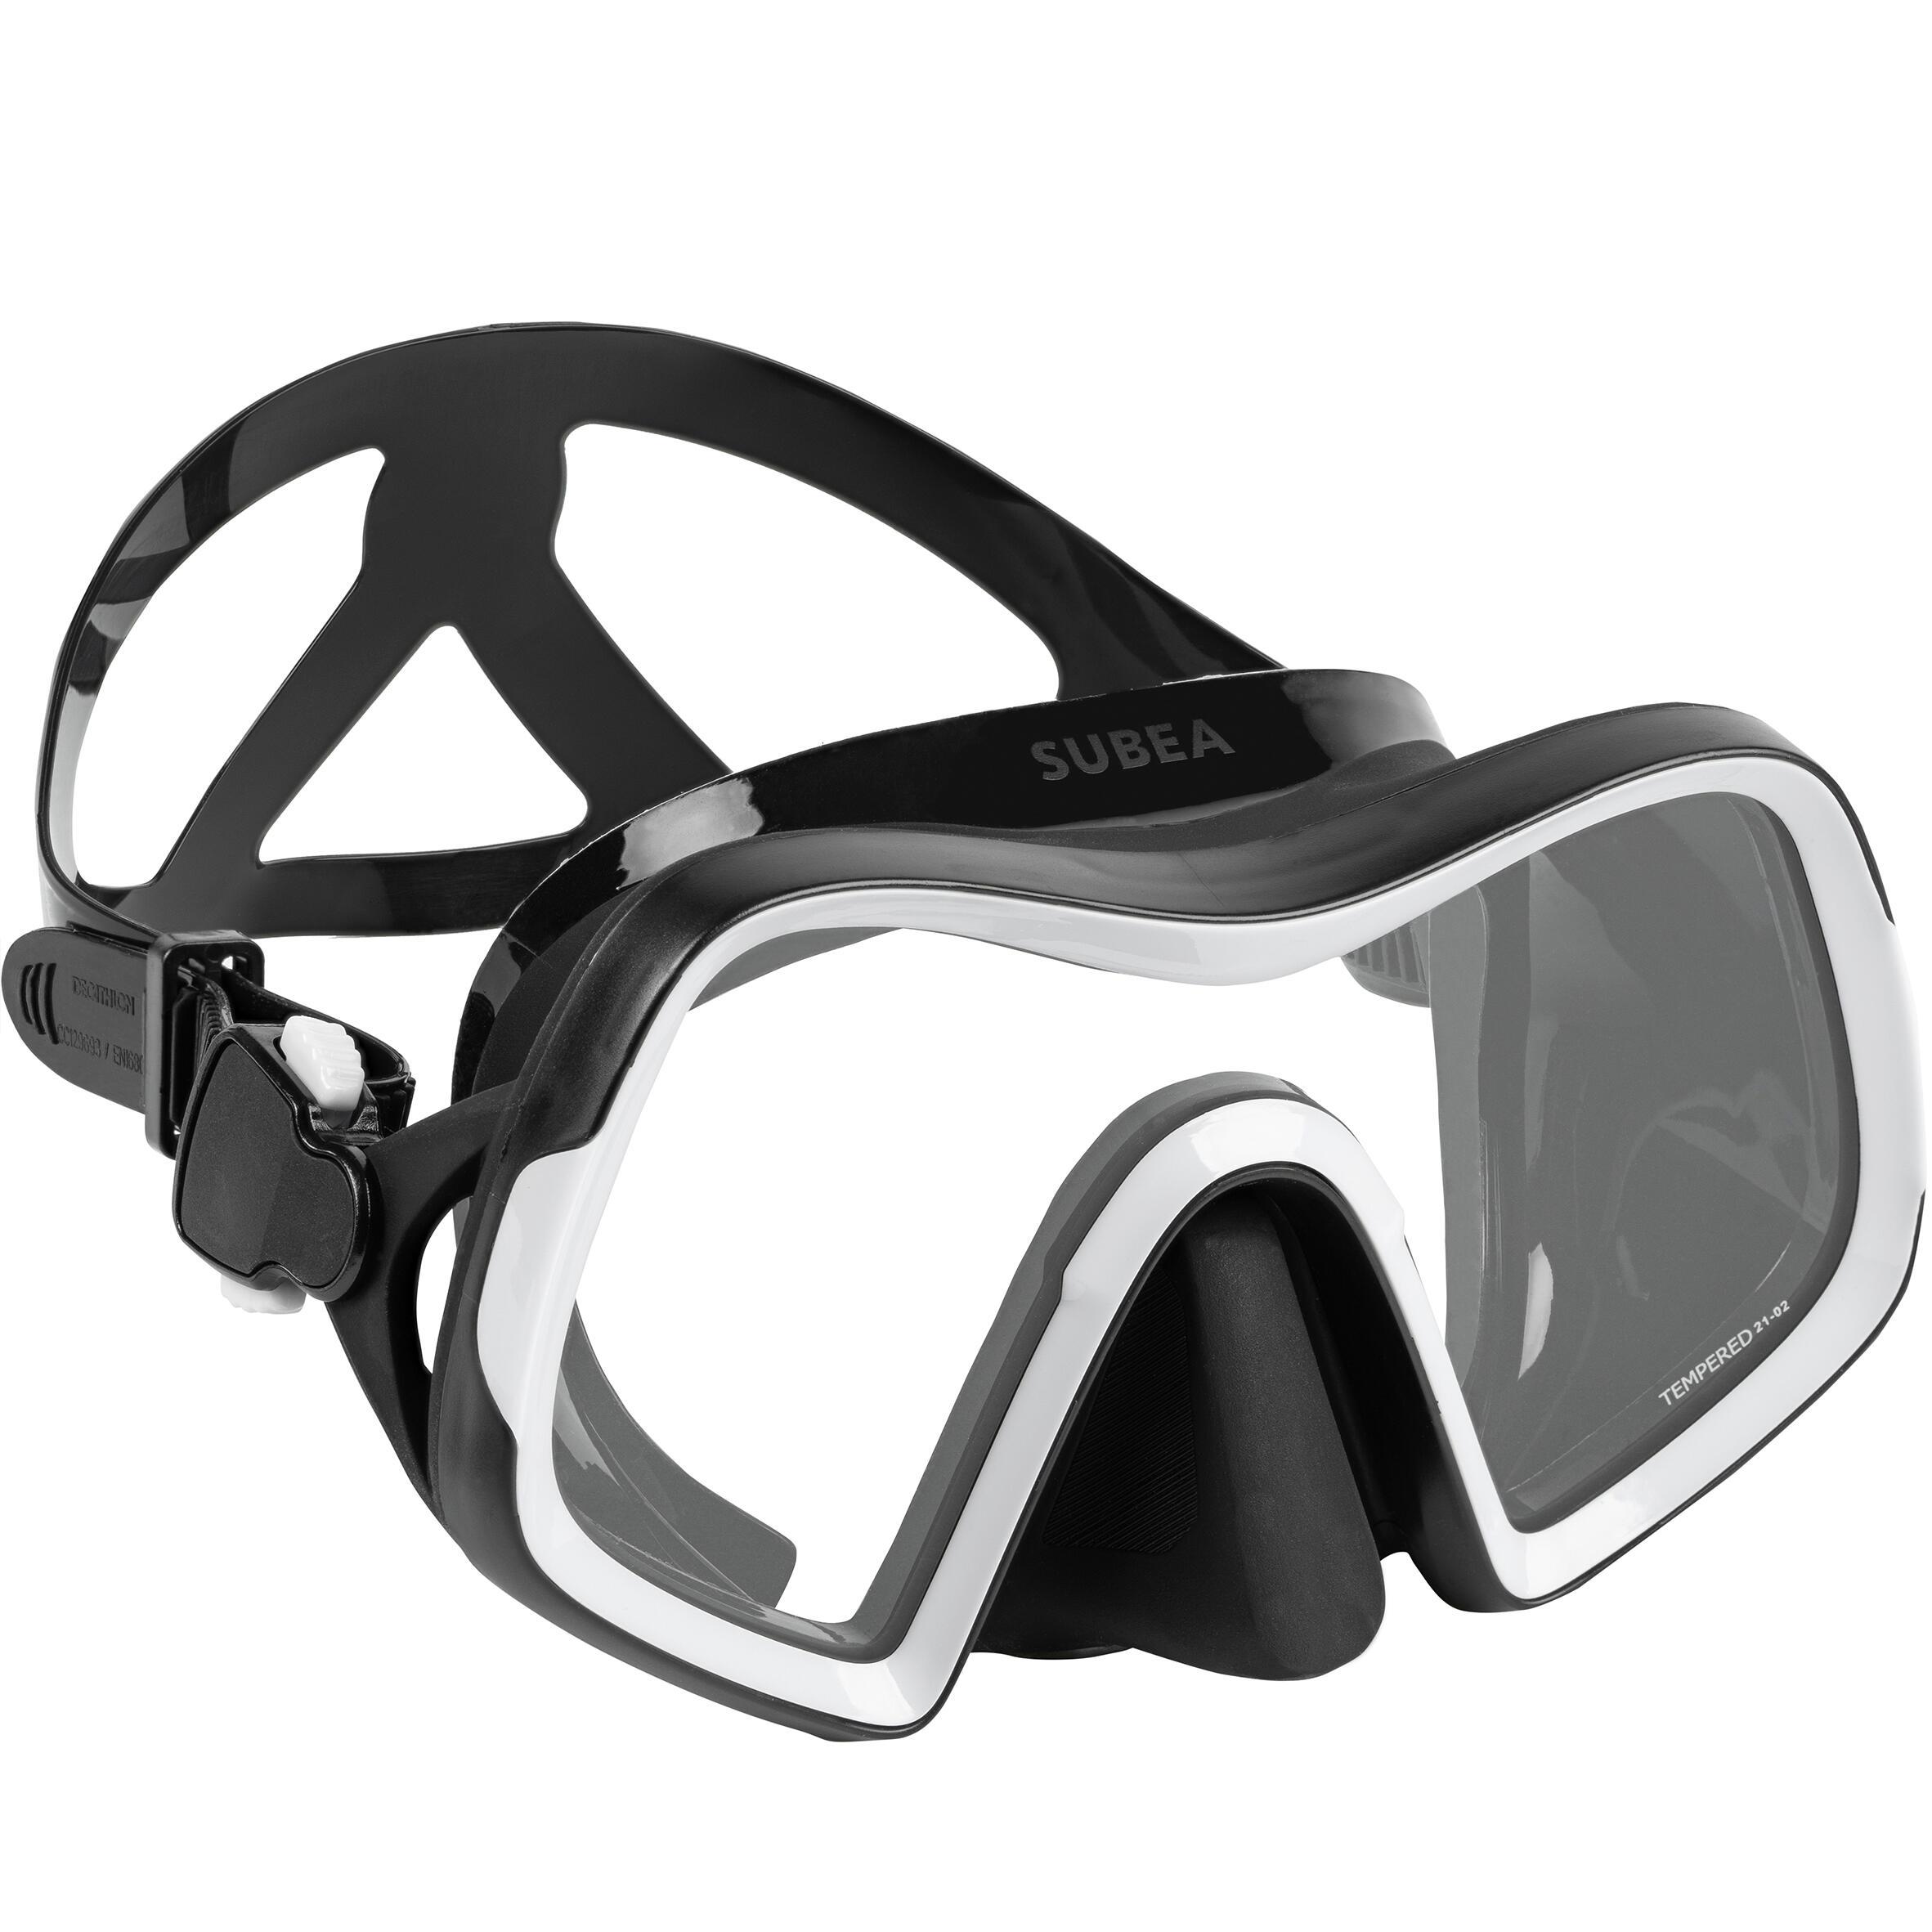 Diving mask SCD 500 V2 single lens black skirt and grey strap - L By SUBEA   Decathlon